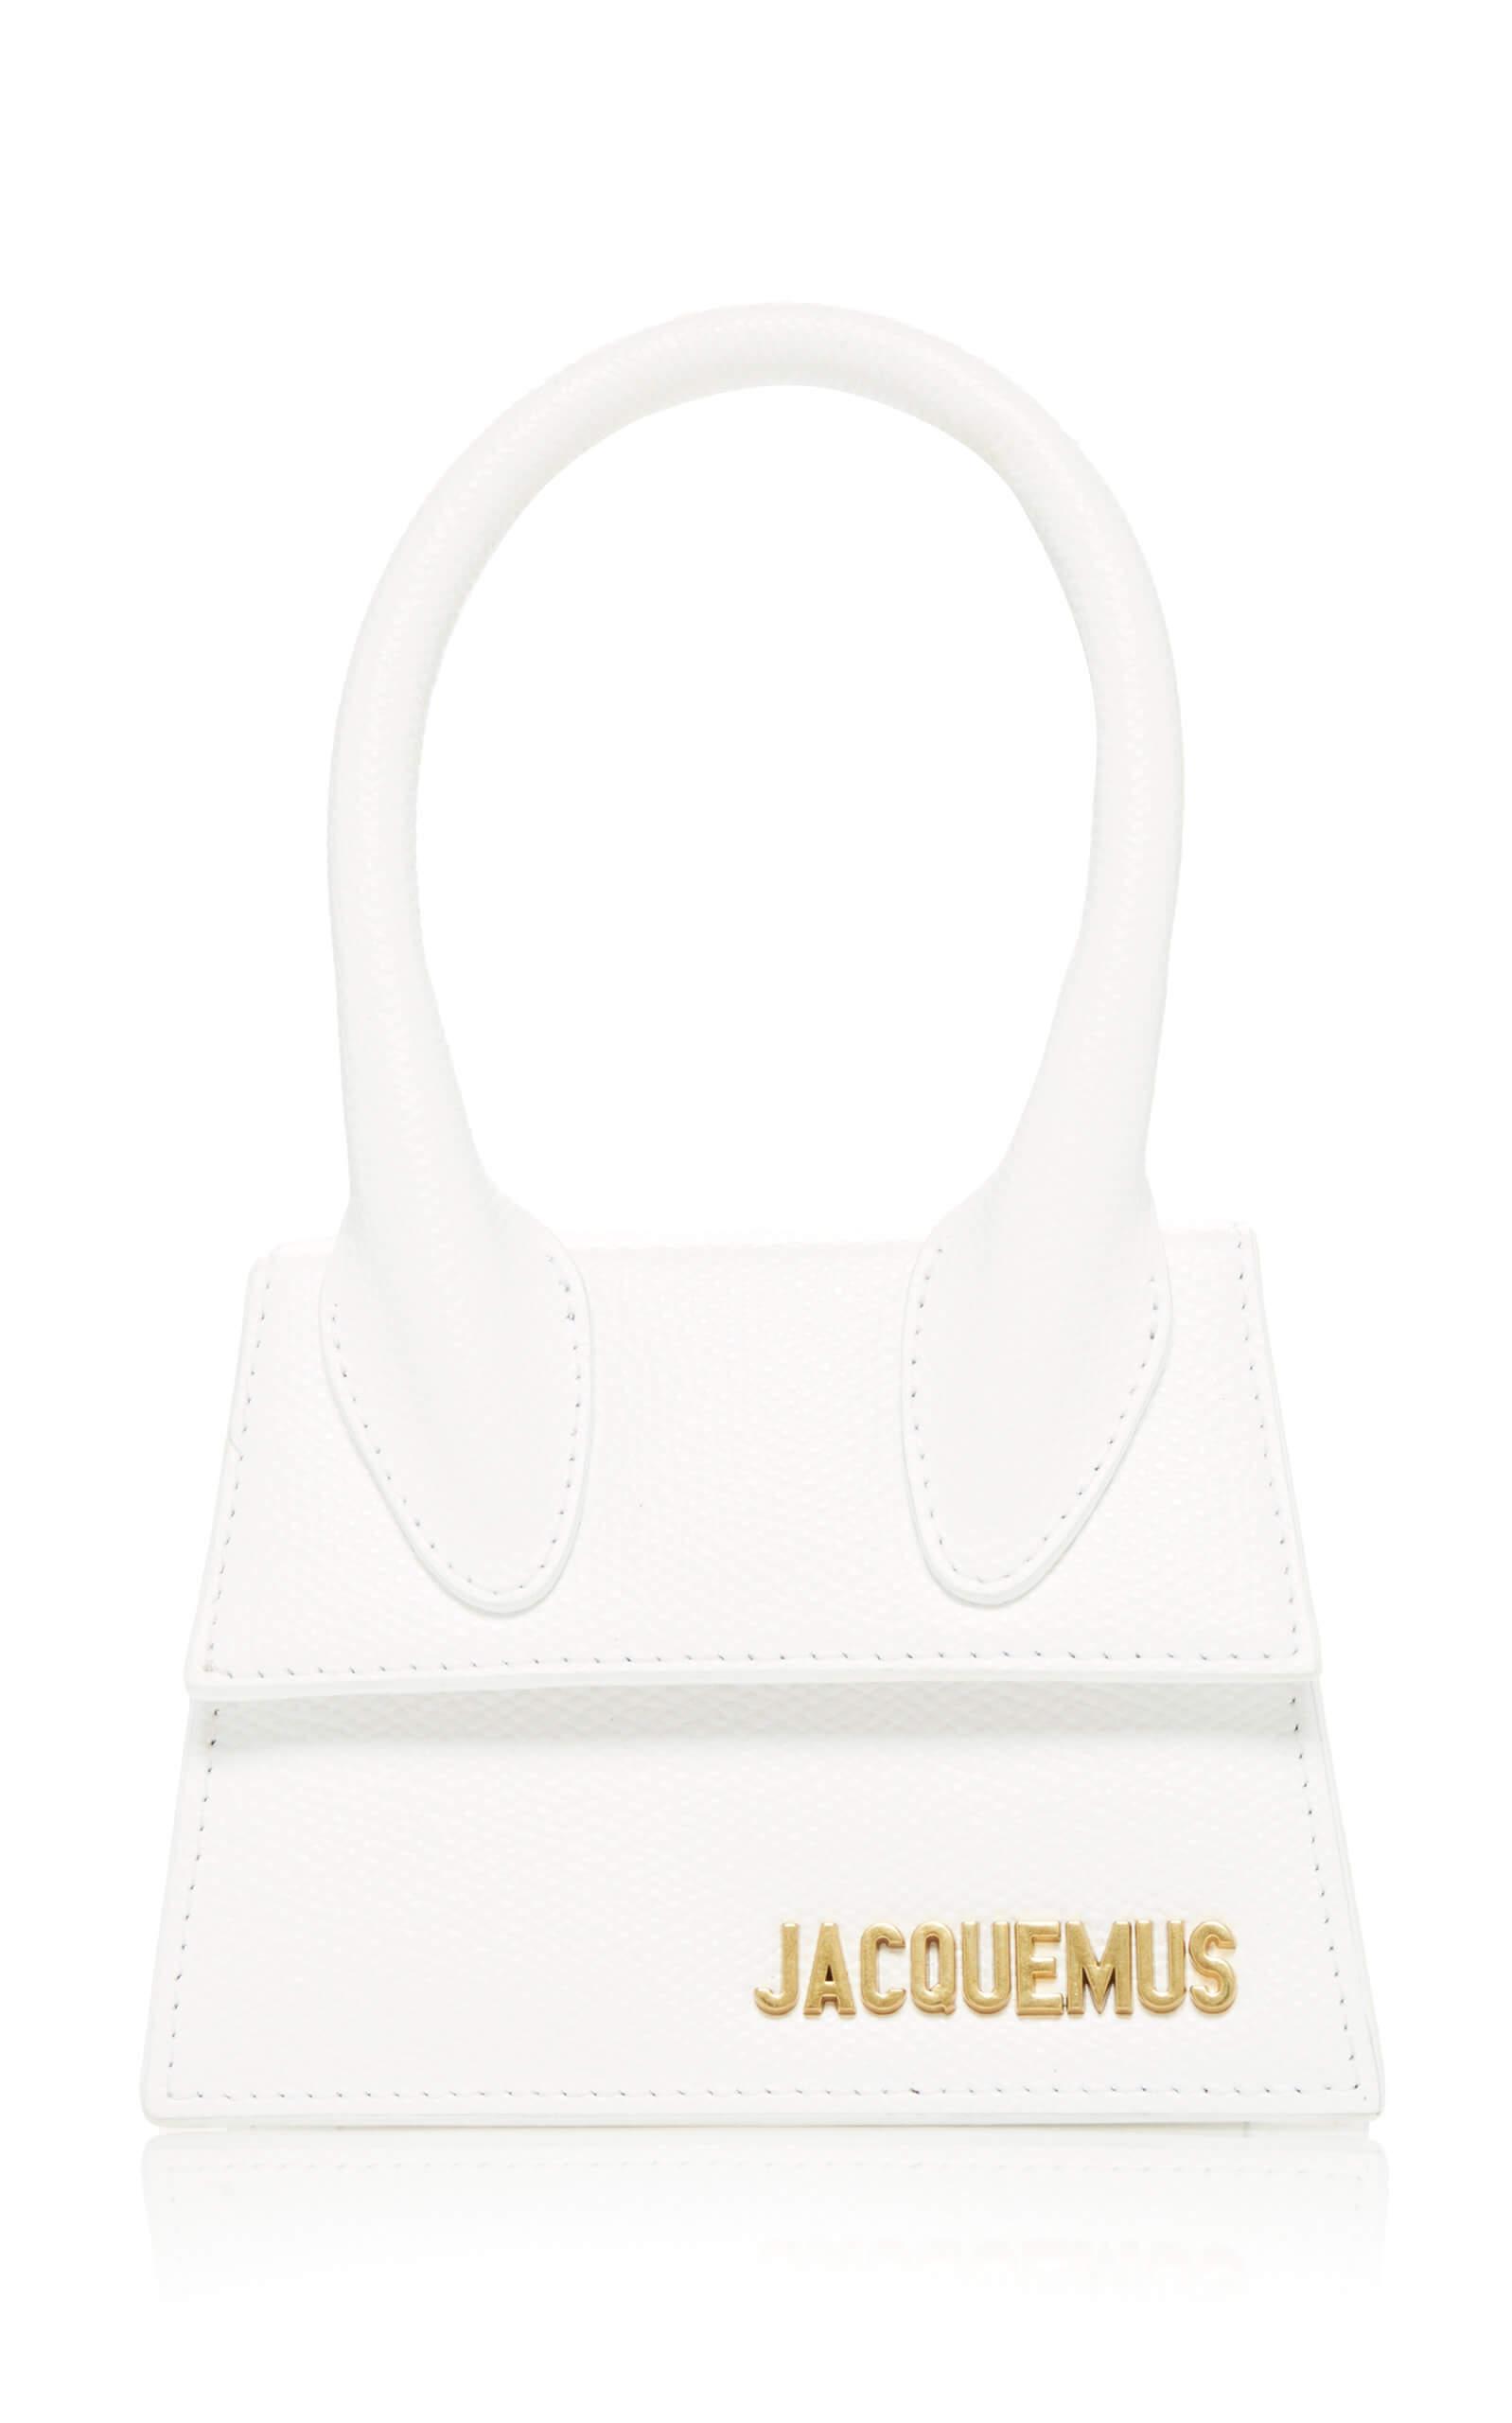 Jacquemus - Le Chiquito Mini Leather Bag